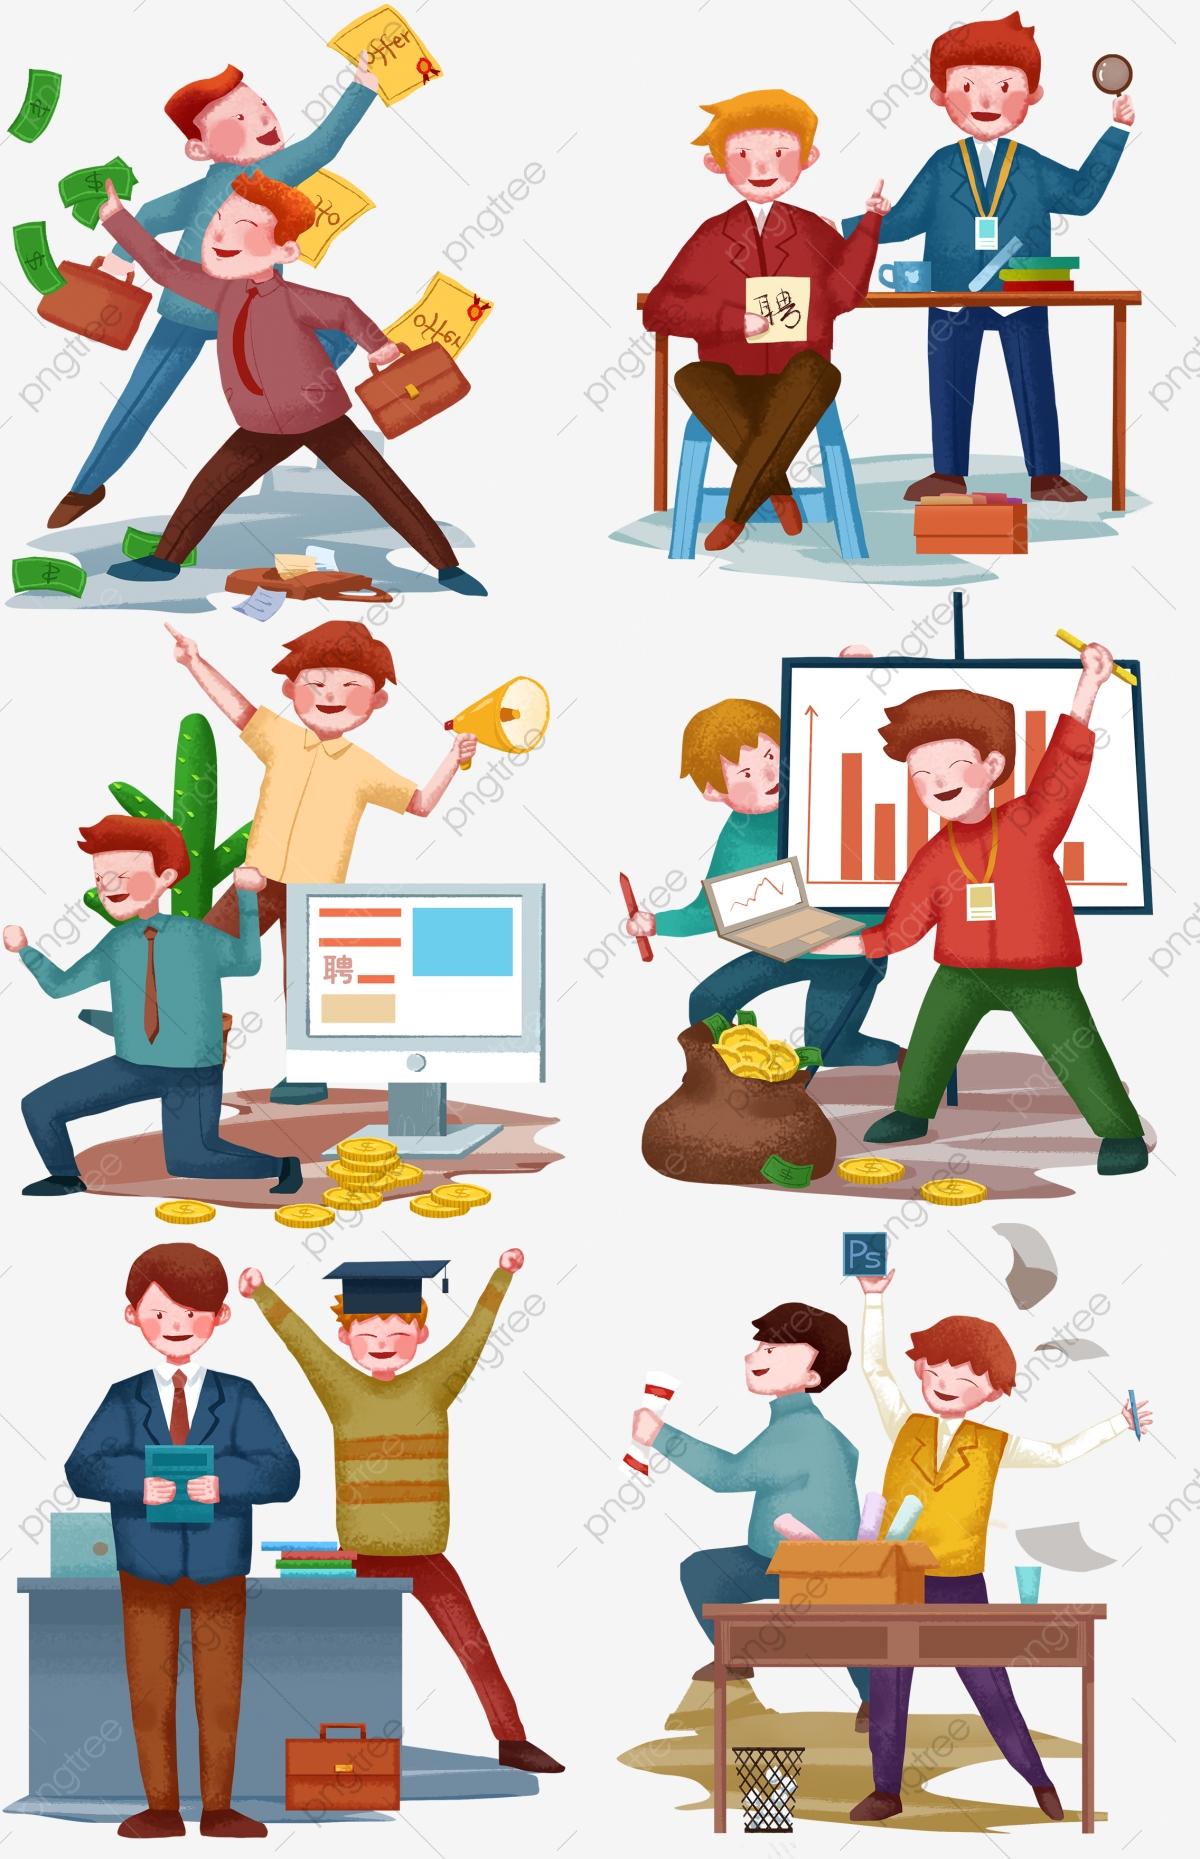 Staff Illustration Hand Drawn Recruitment Location Office.